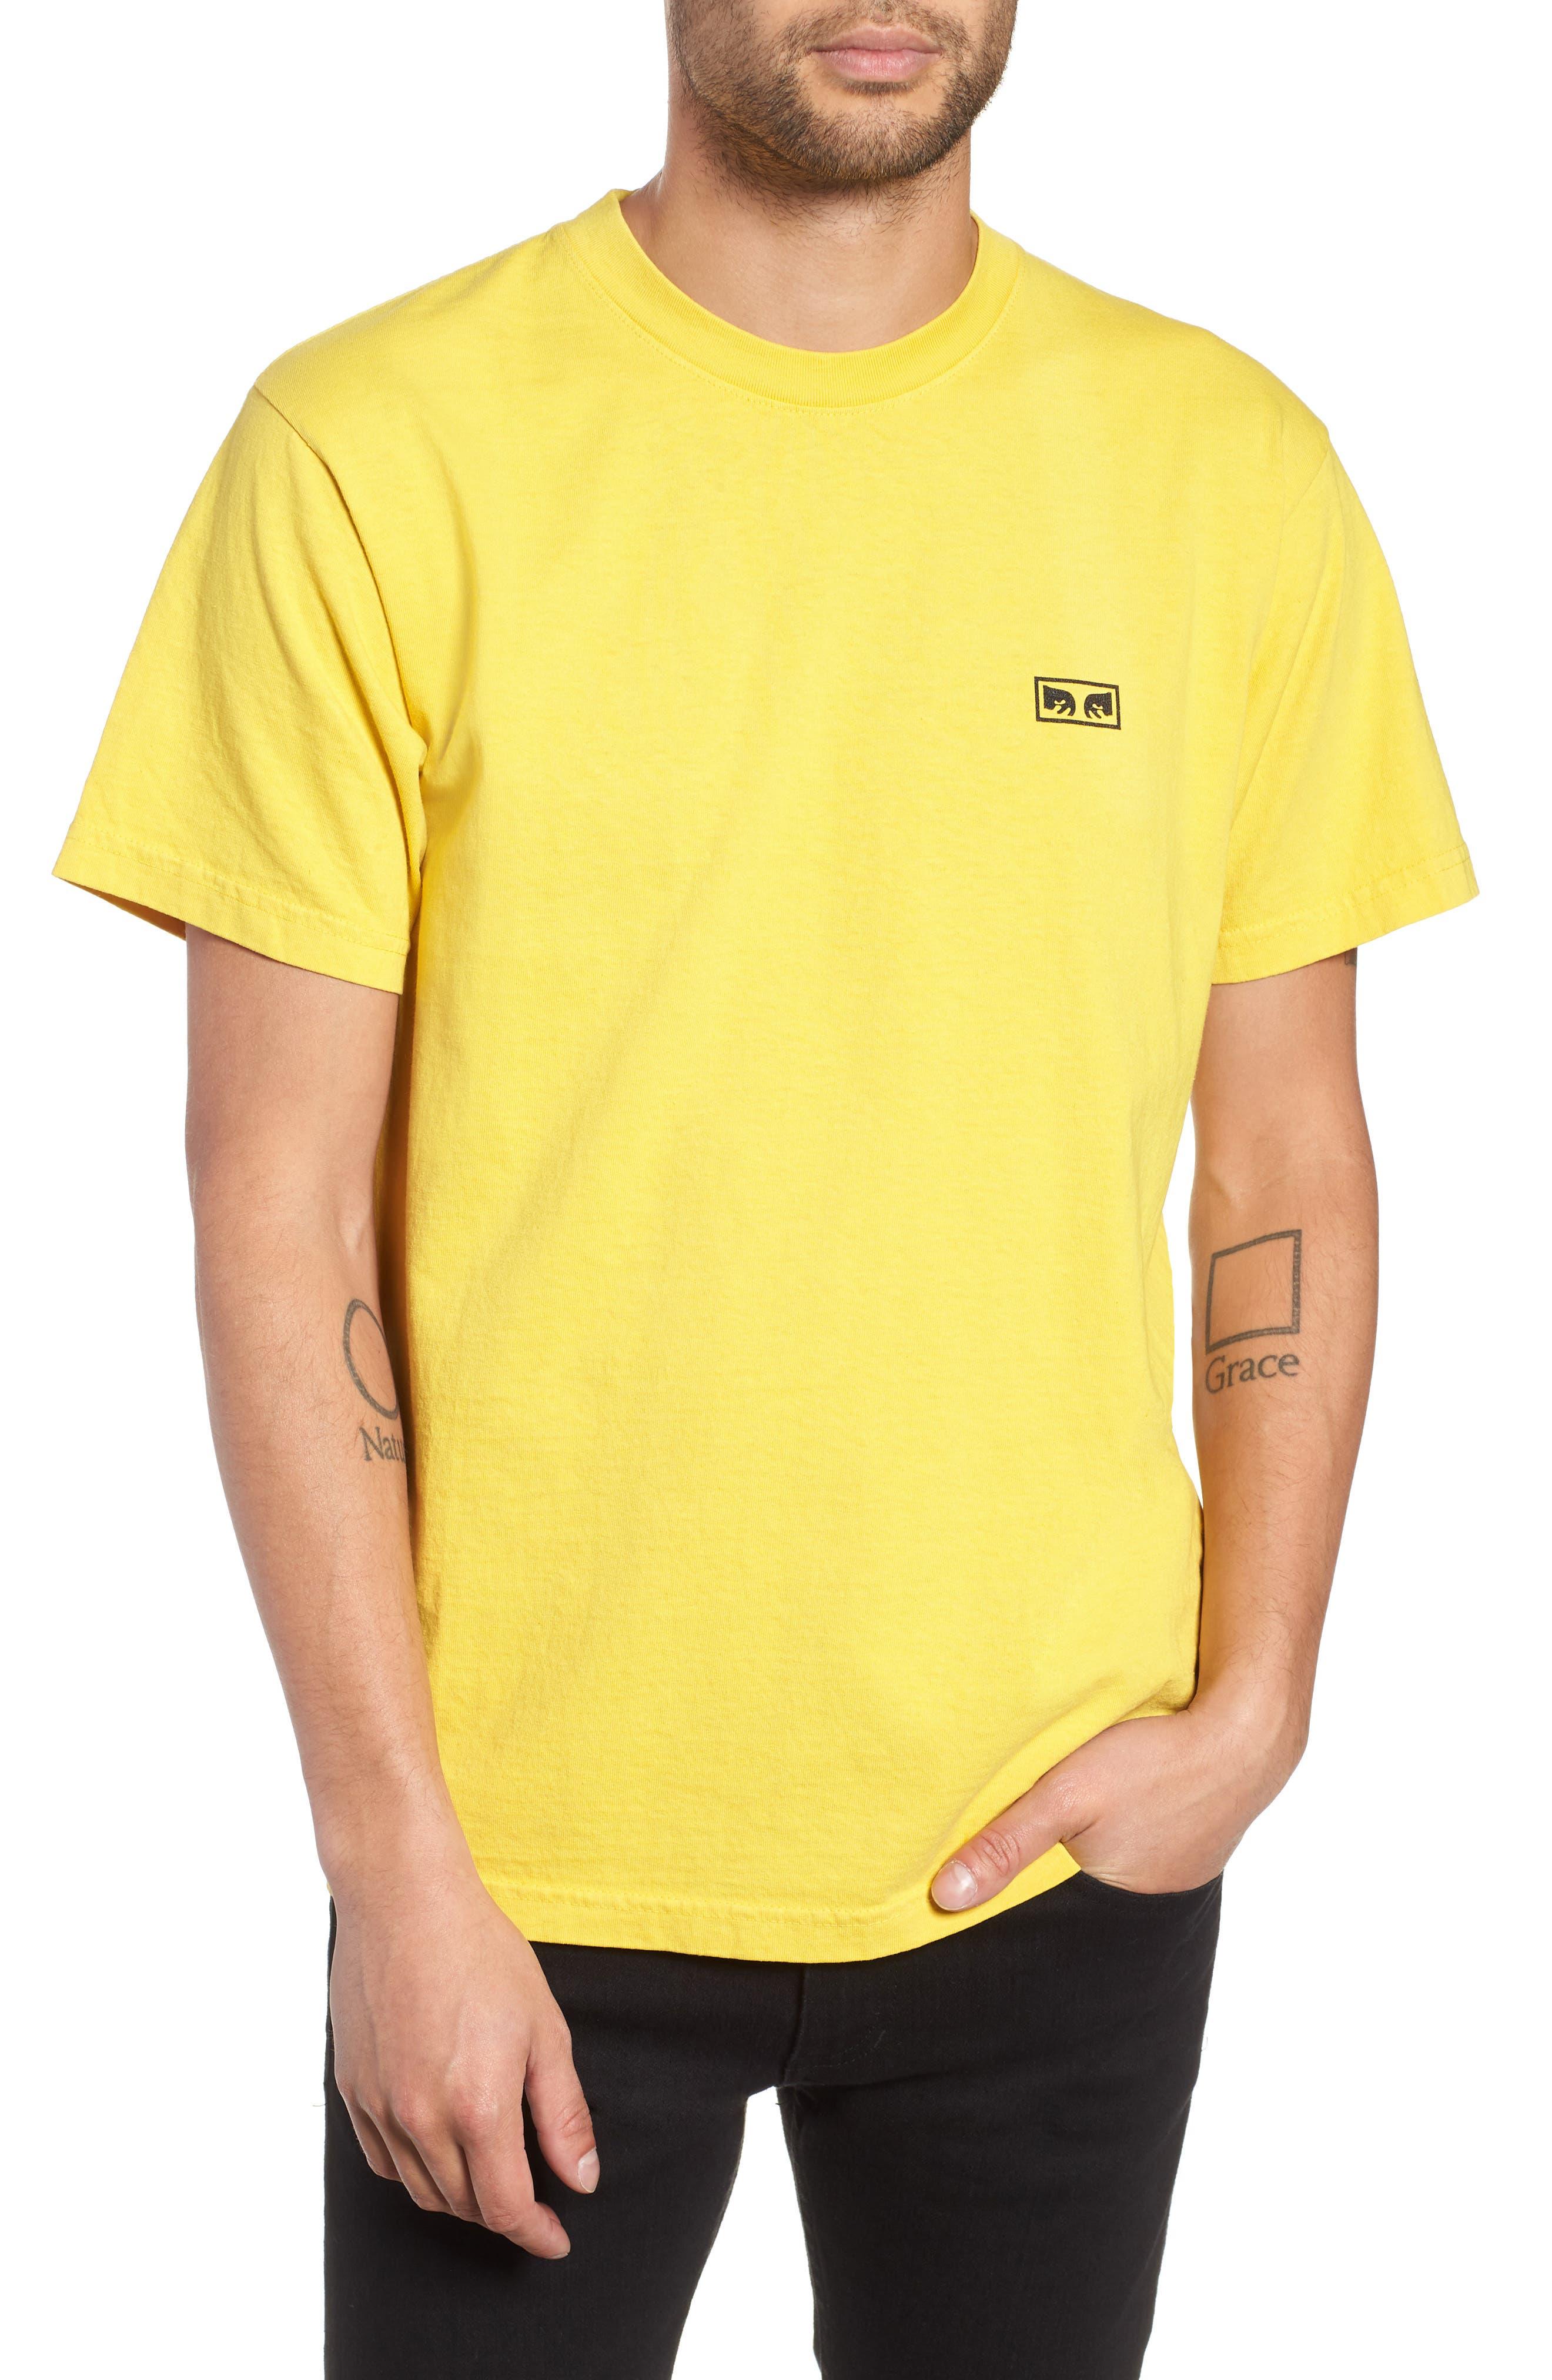 No One Box T-Shirt,                             Main thumbnail 1, color,                             SPECTRA YELLOW